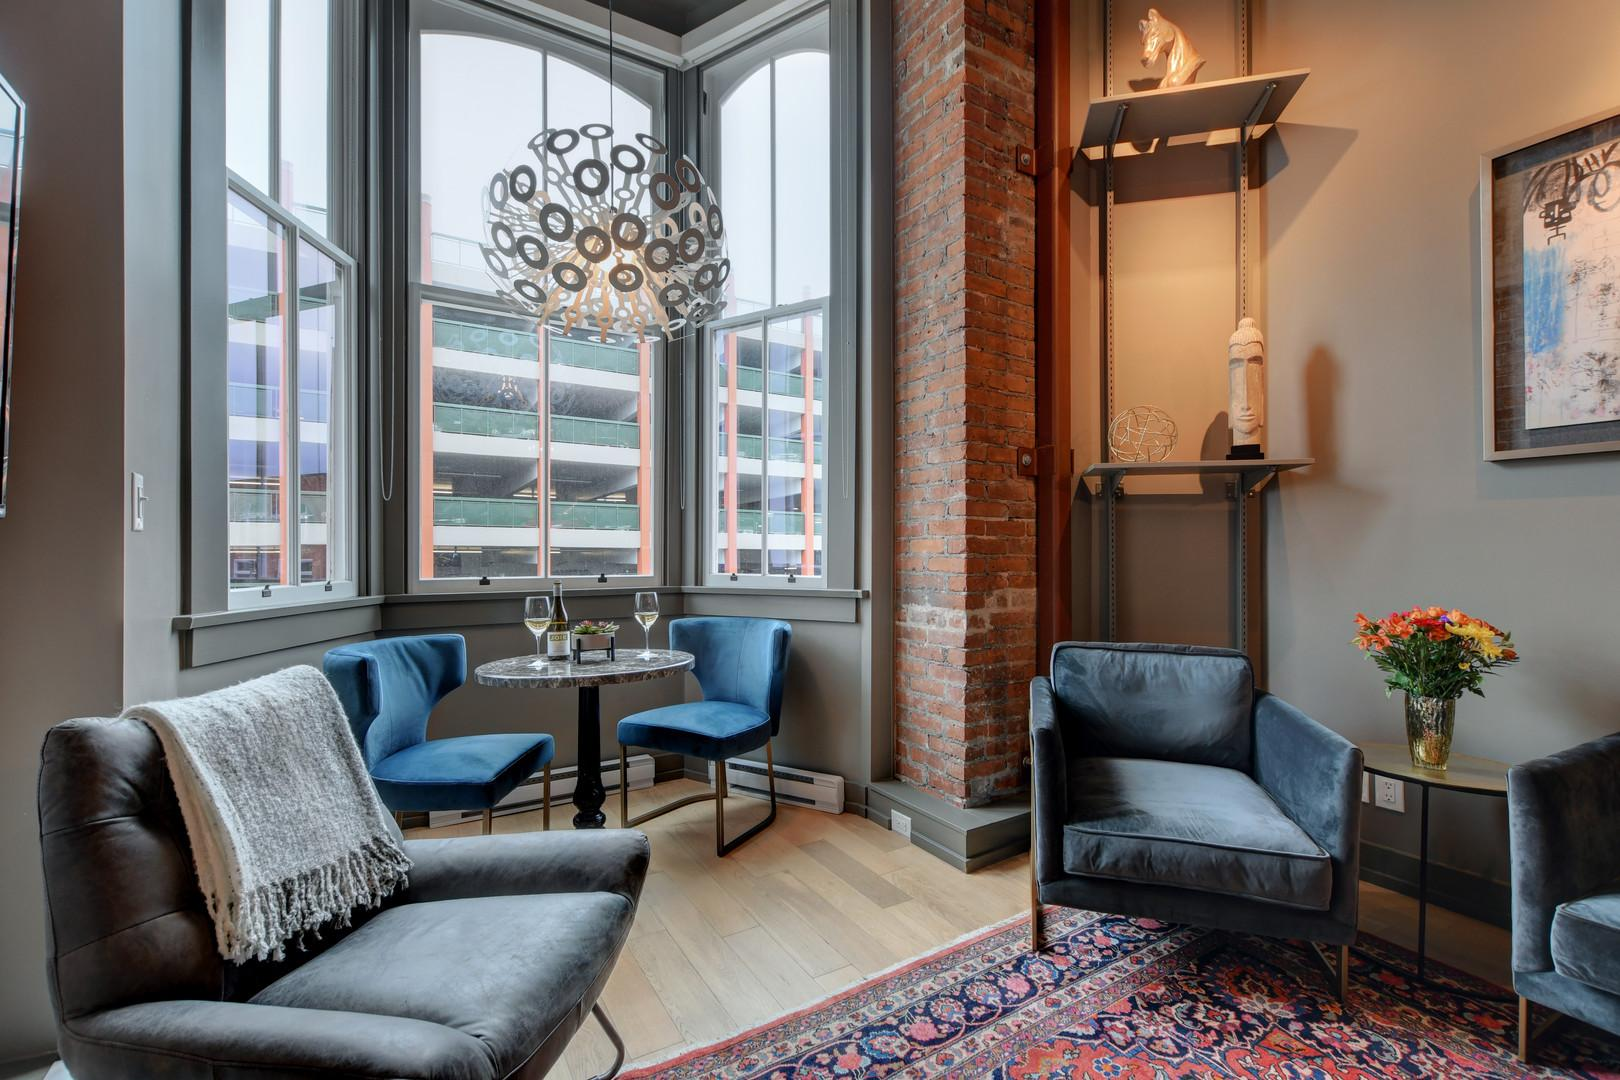 Real Estate Investment Workshop: Airbnb in Victoria (Dec 10)